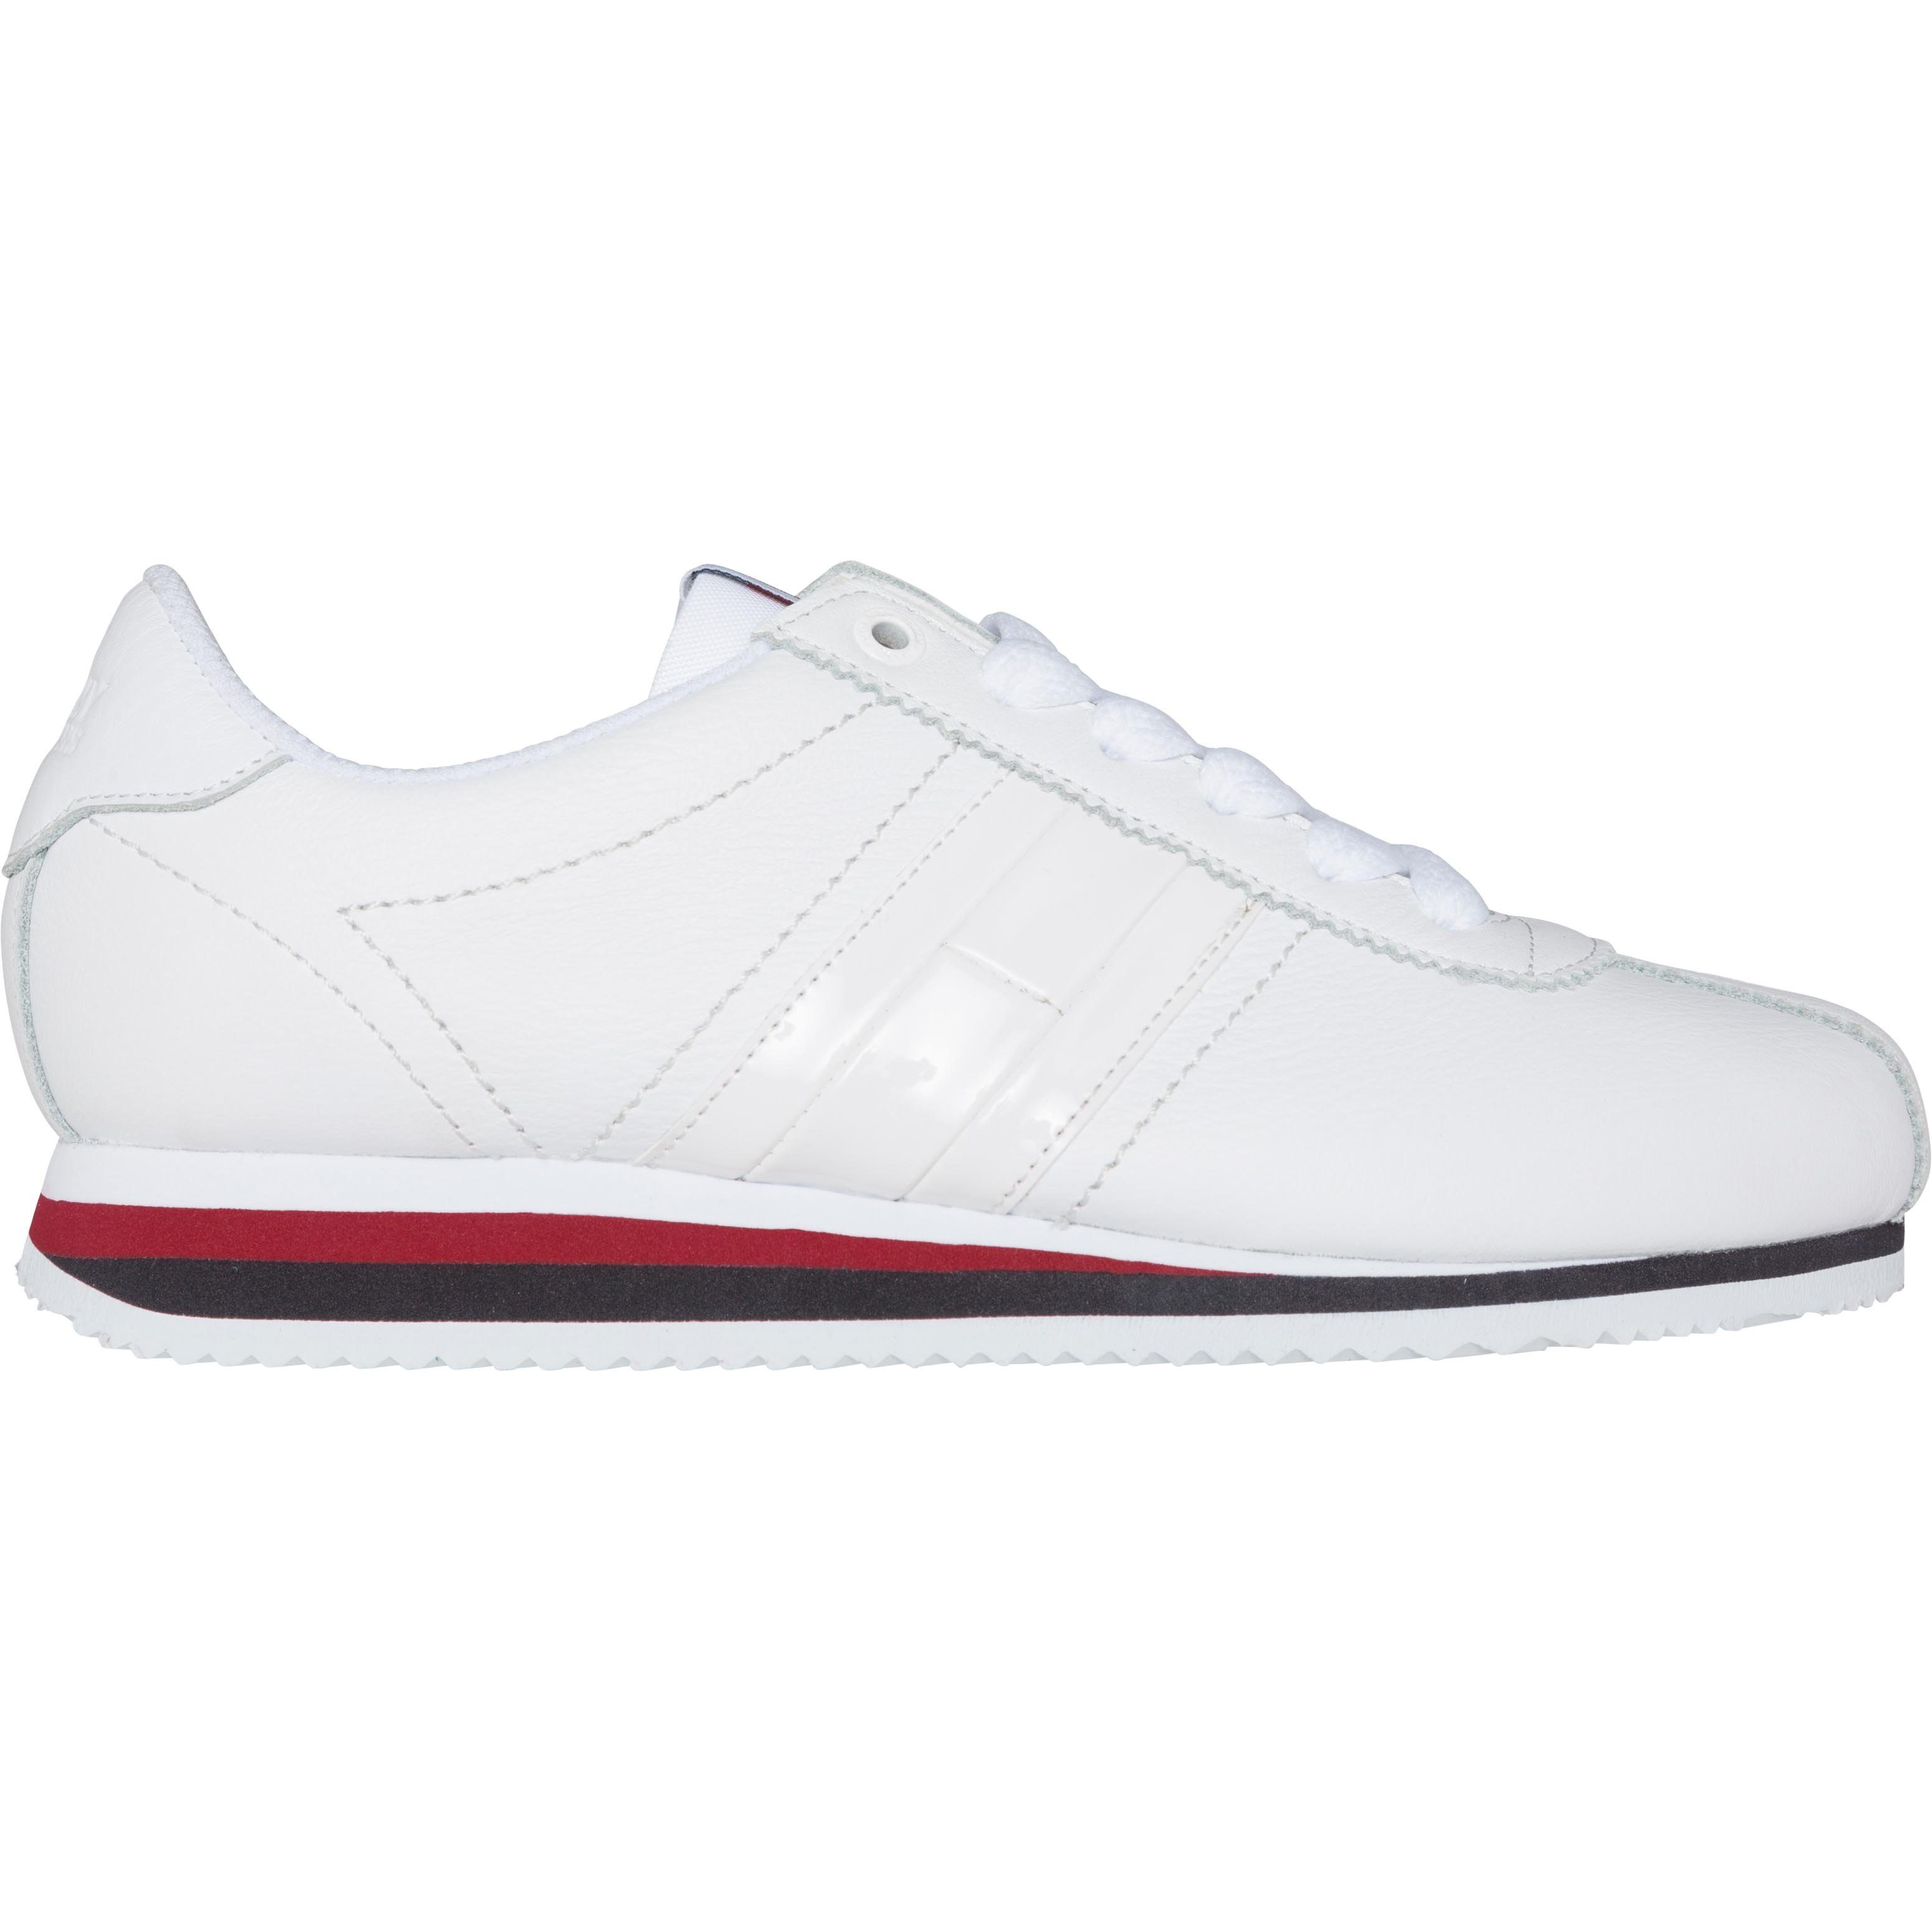 Tommy Jeans Tommy Jeans Sneaker » Retro Flag Sneaker«, Weiß, White